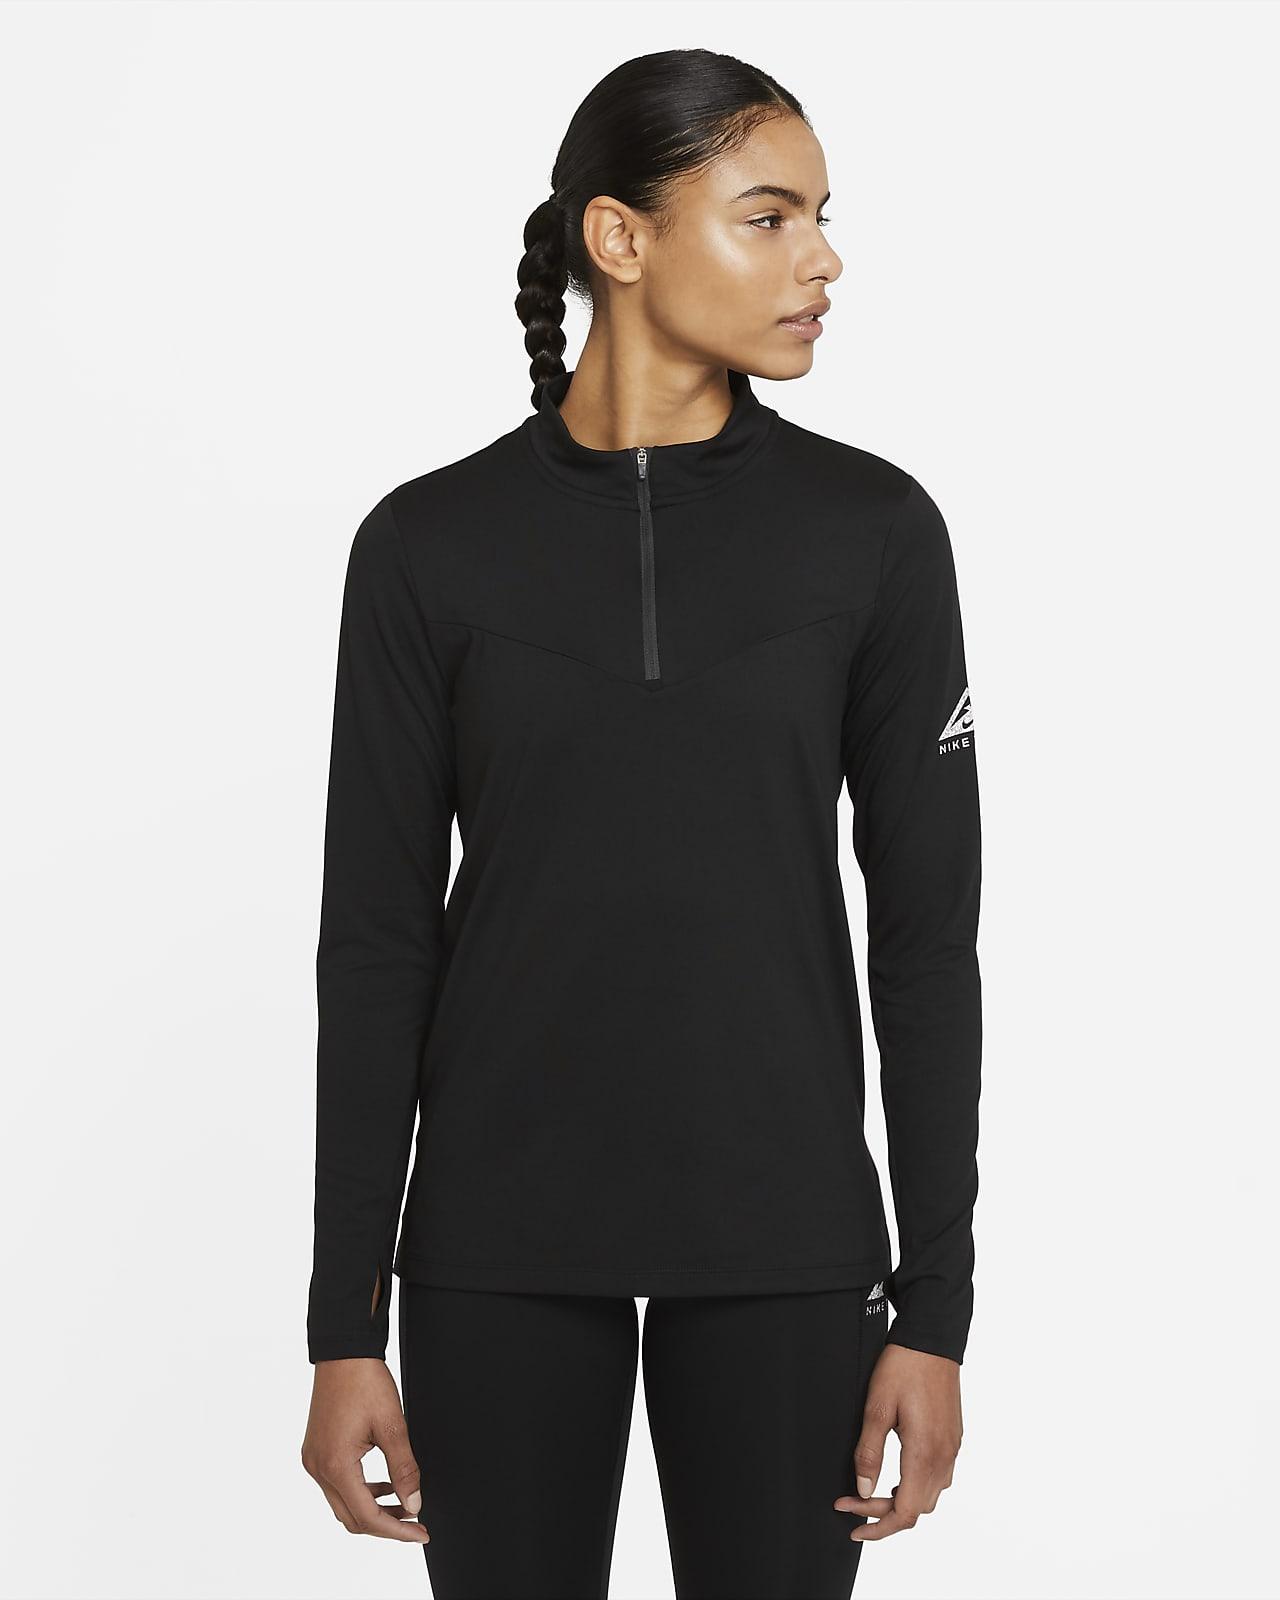 Prenda de capa media de trail running para mujer Nike Element